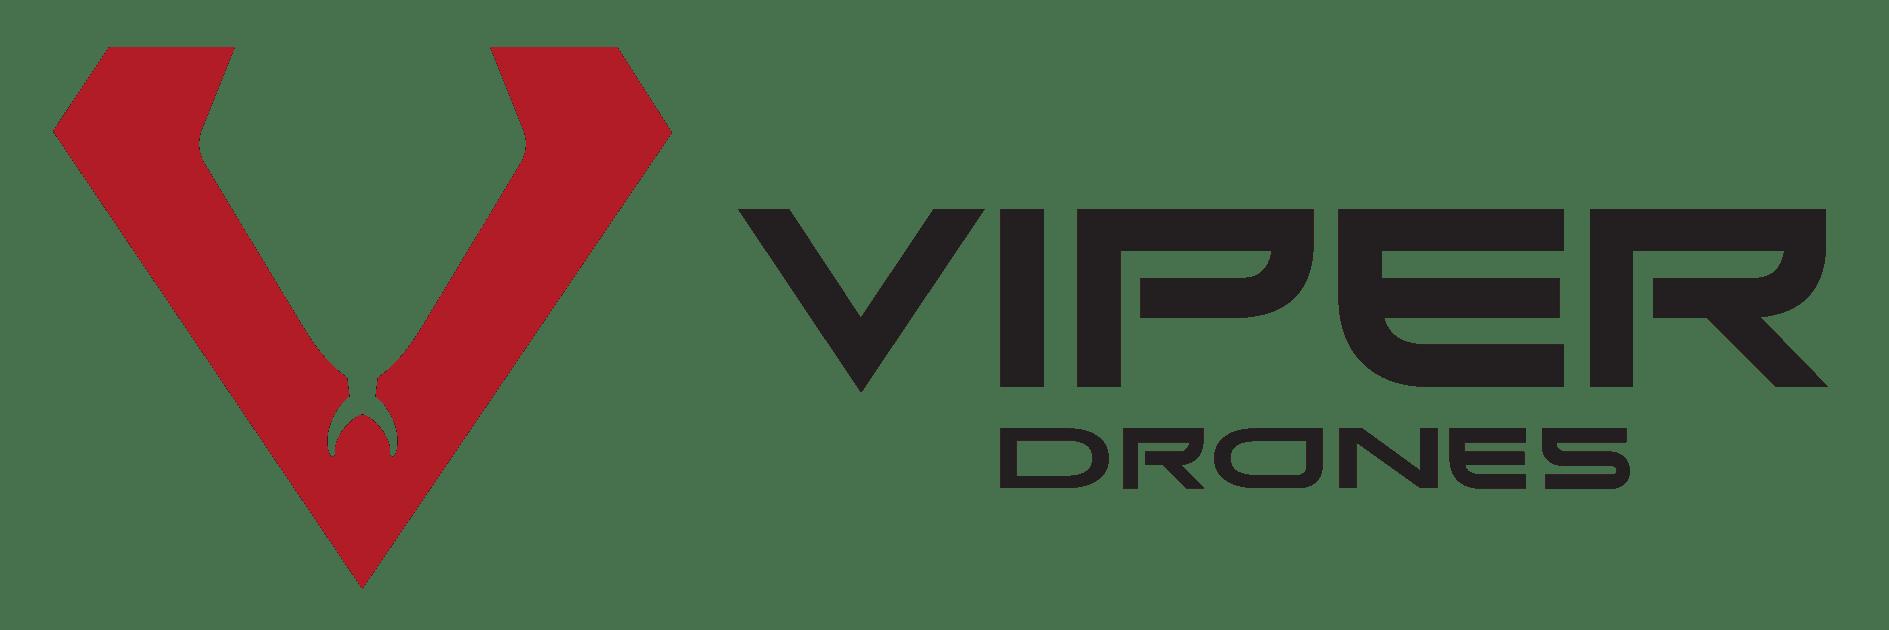 Viper Vantage Solution -Ultimate Gas Leak Detection System